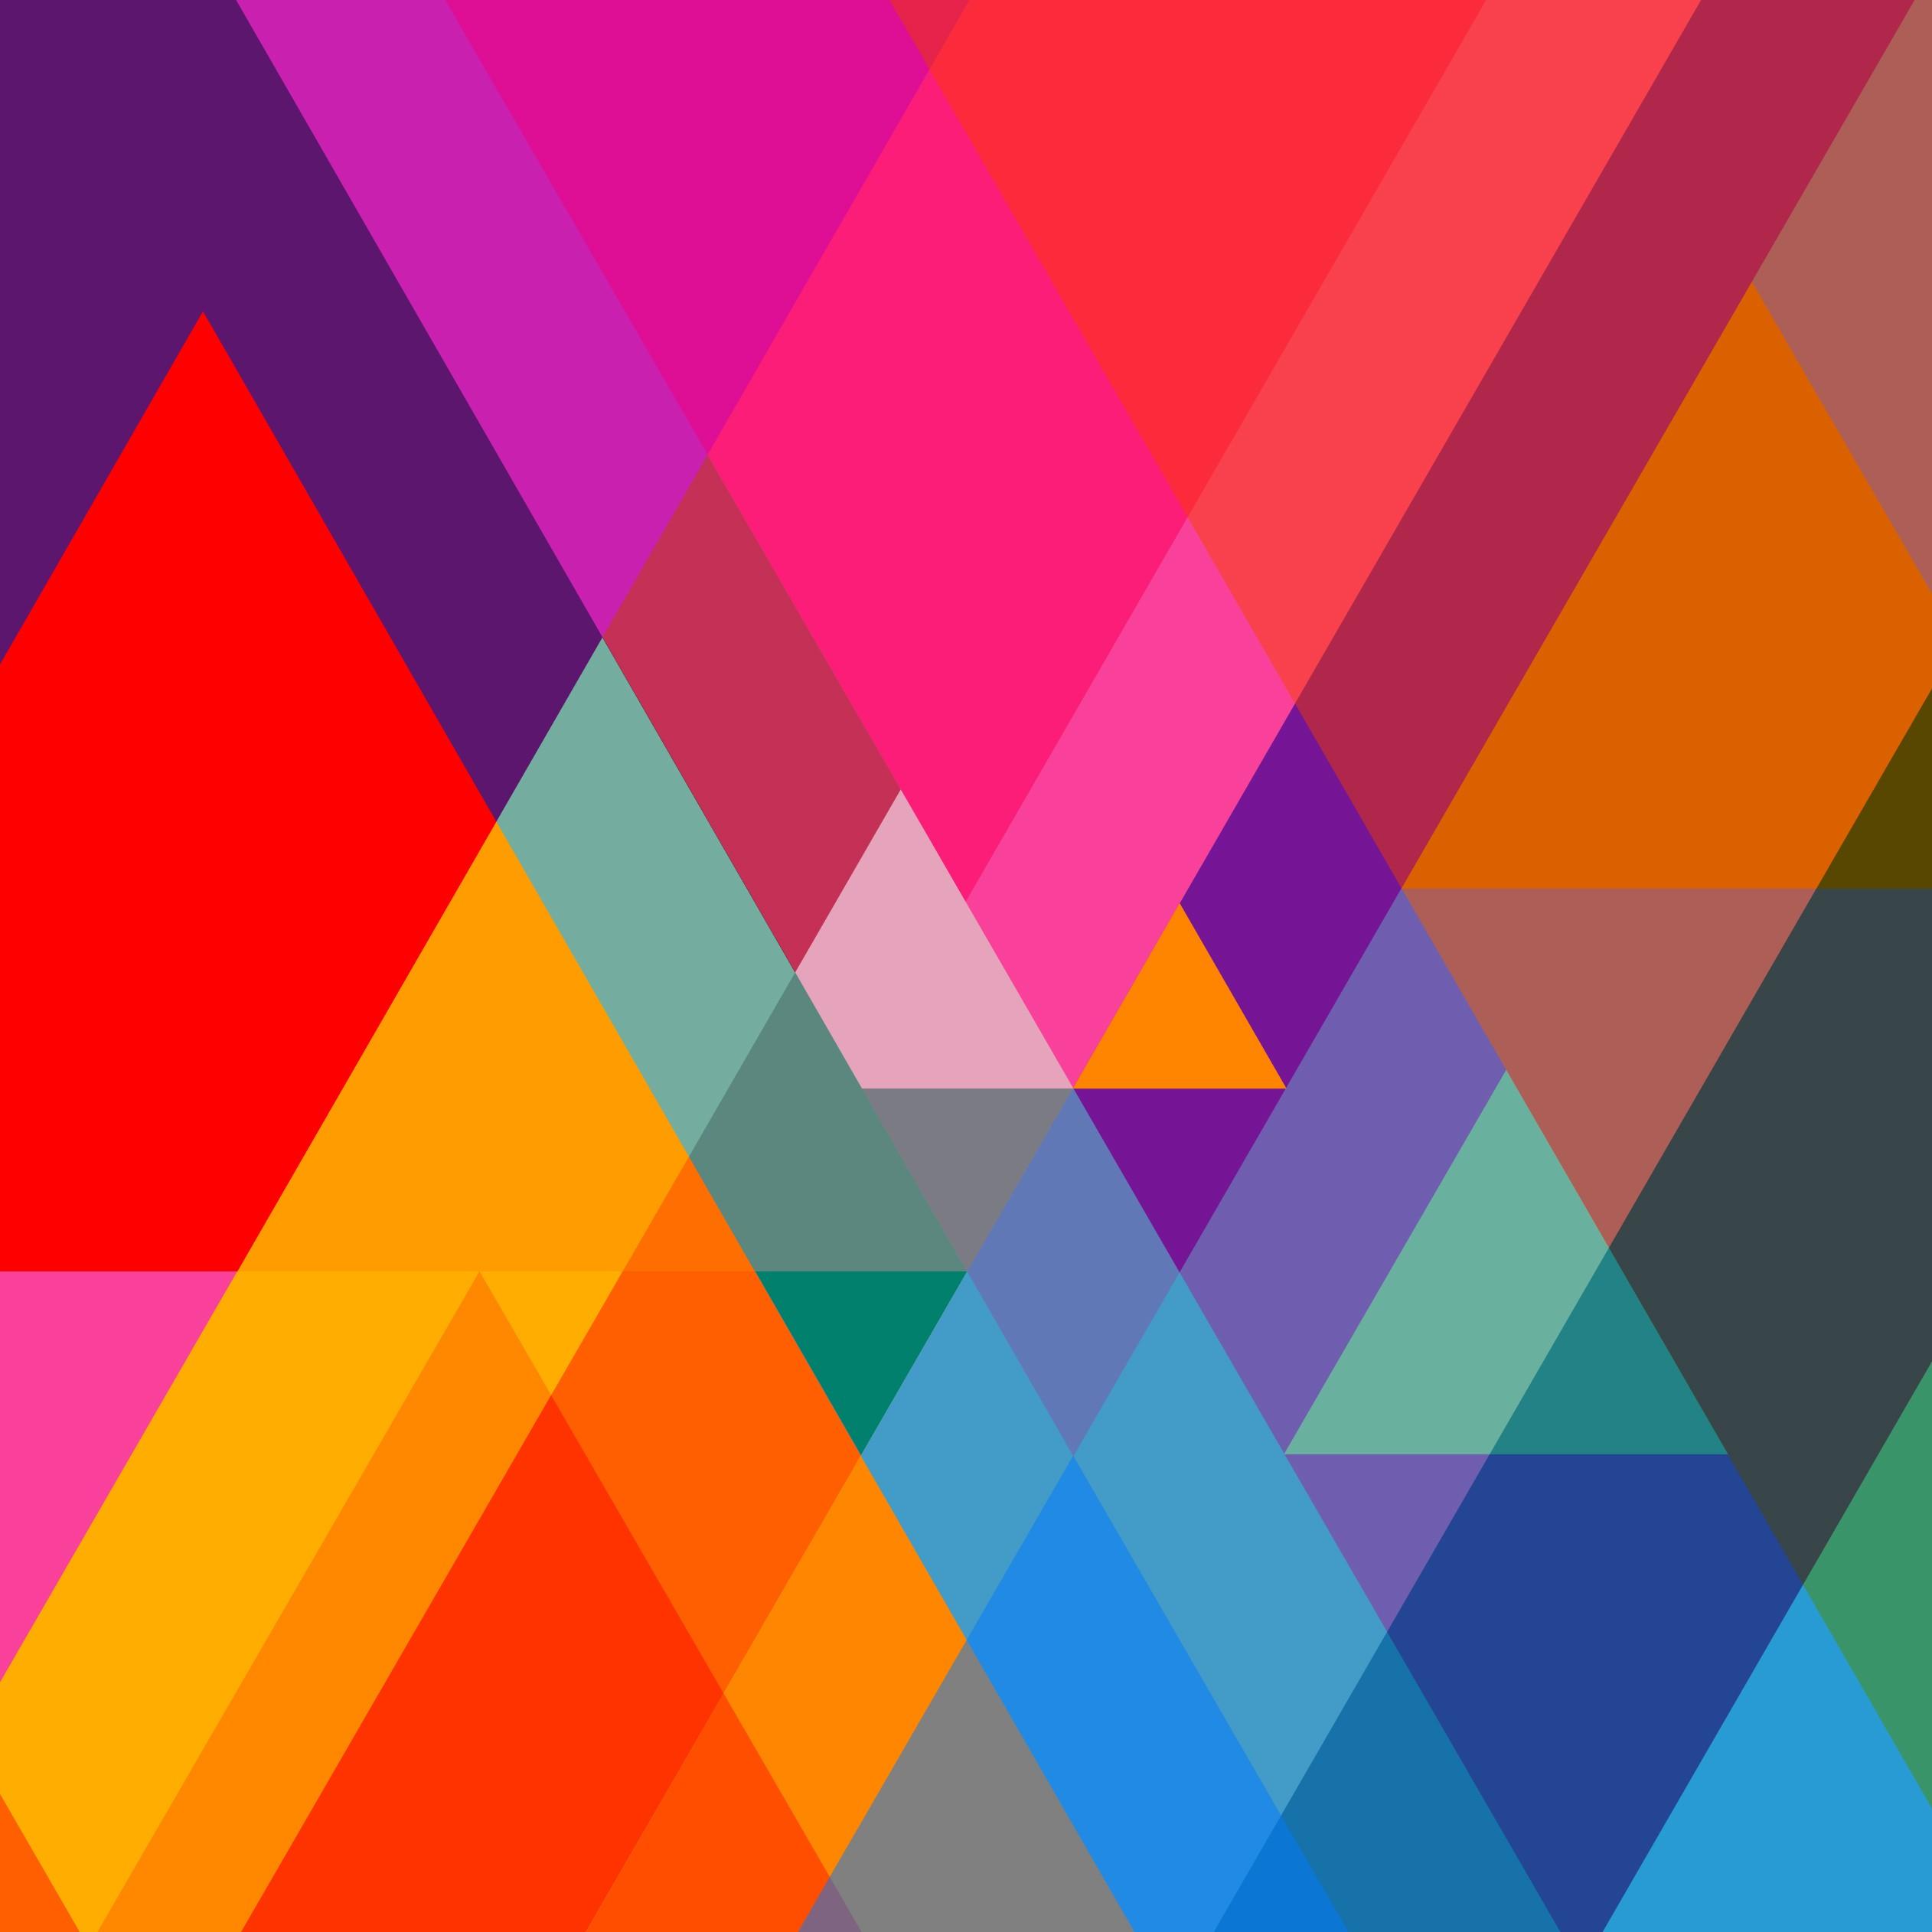 Popular Wallpaper High Resolution Geometric - polygon-2524x2524-4k-5k-wallpaper-iphone-wallpaper-triangle-3520  2018_197766.jpg